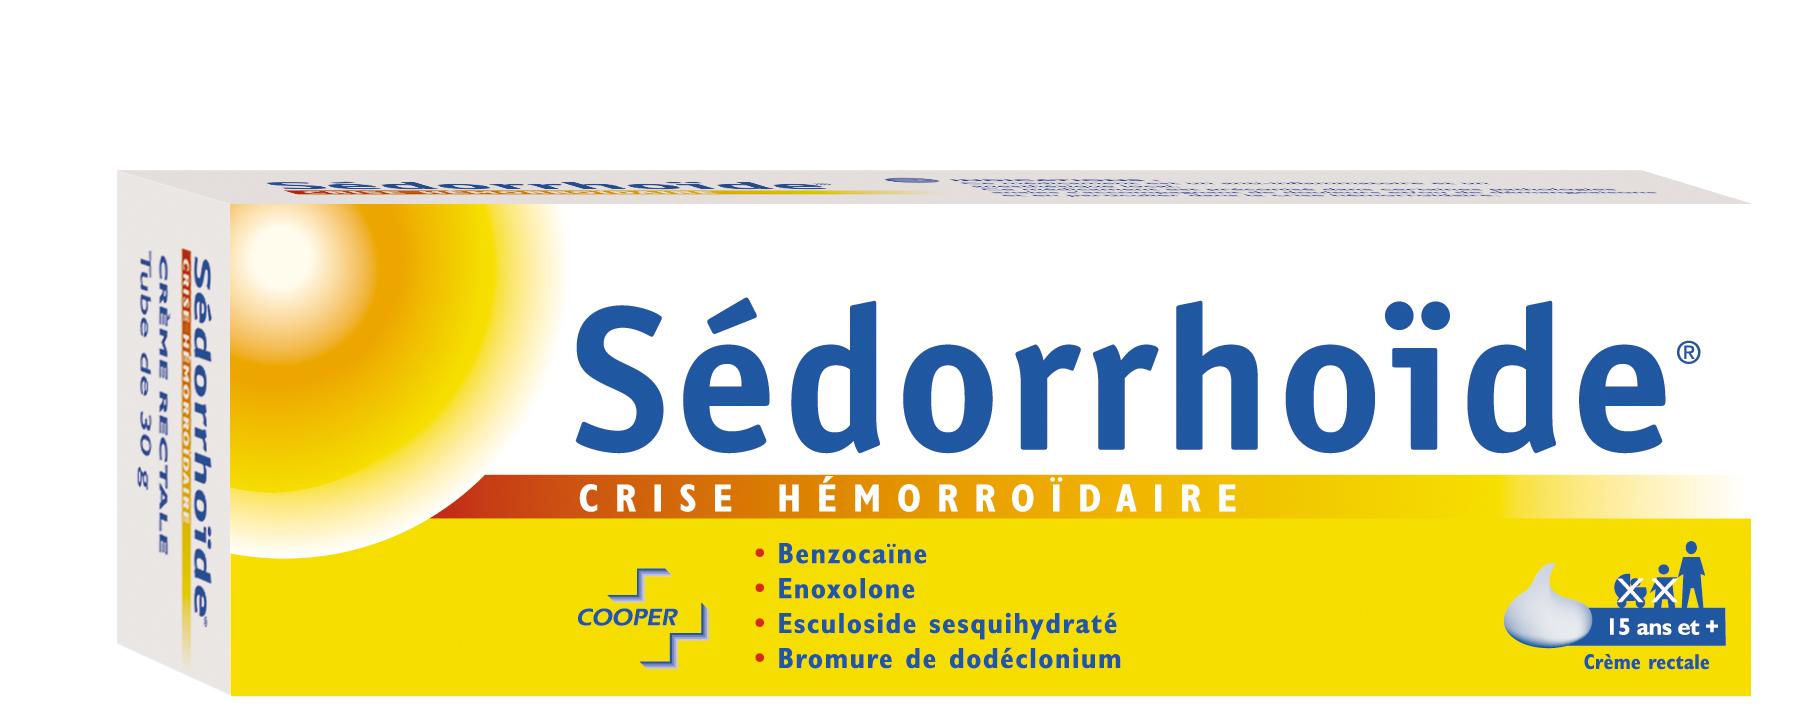 SEDORRHOIDE CRISE HEMORROIDAIRE, 30 g crème rectale   Cooper